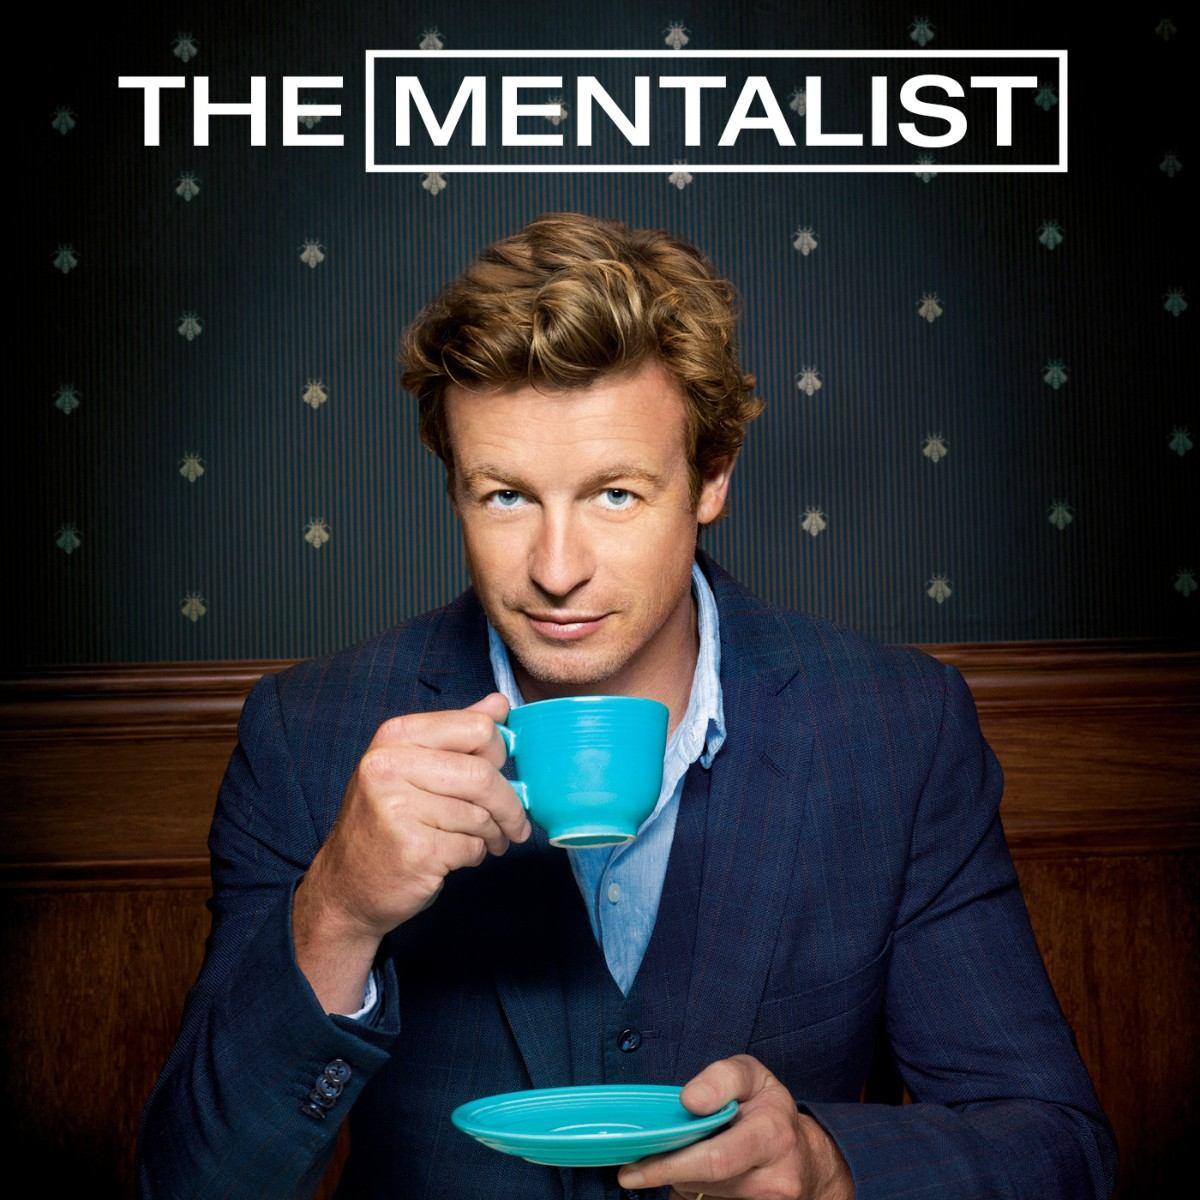 Mentalista 7. séria online seriál